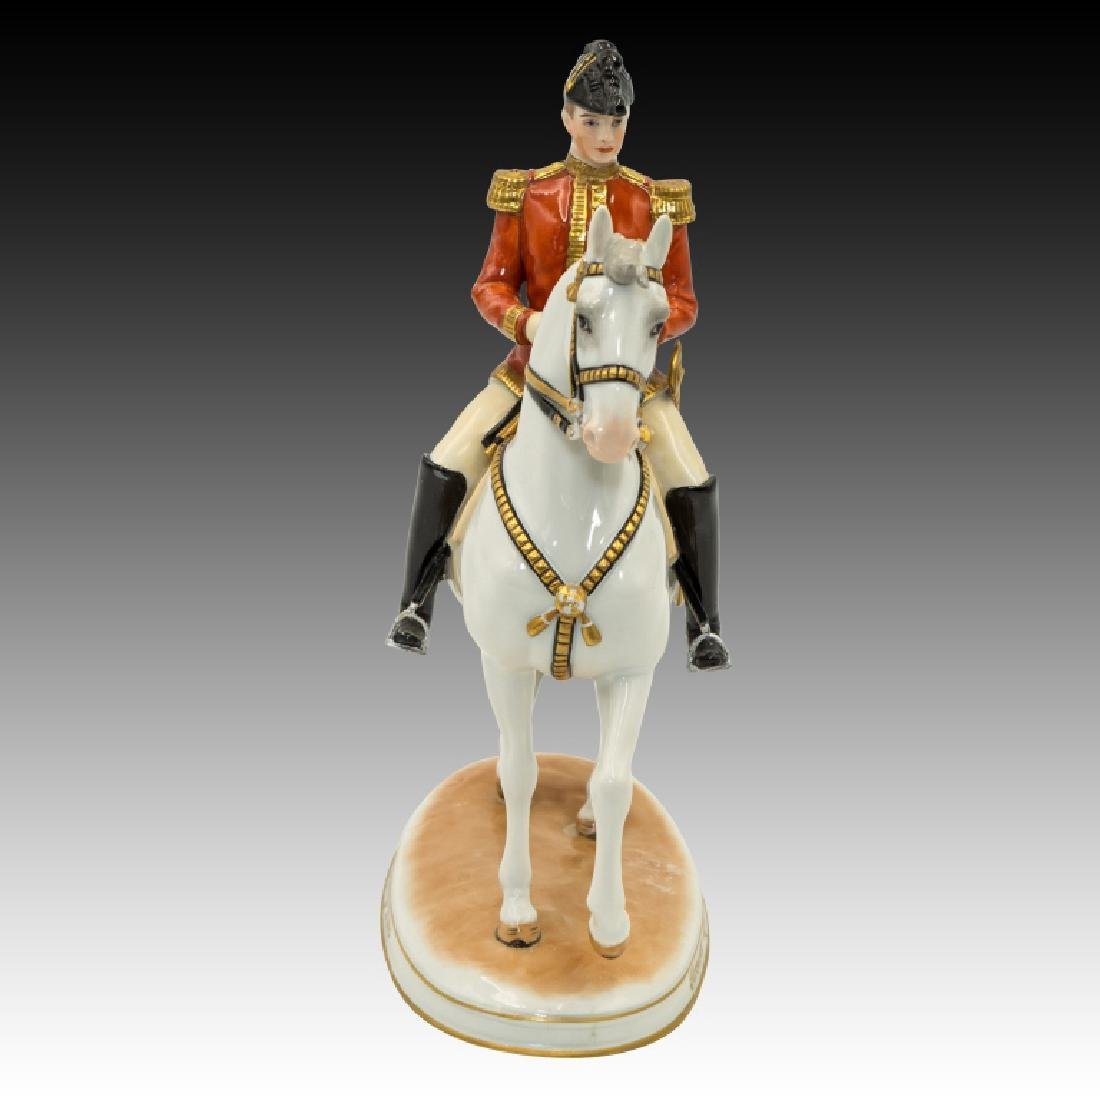 2 Figurines Napoleon and Ticouette - 2